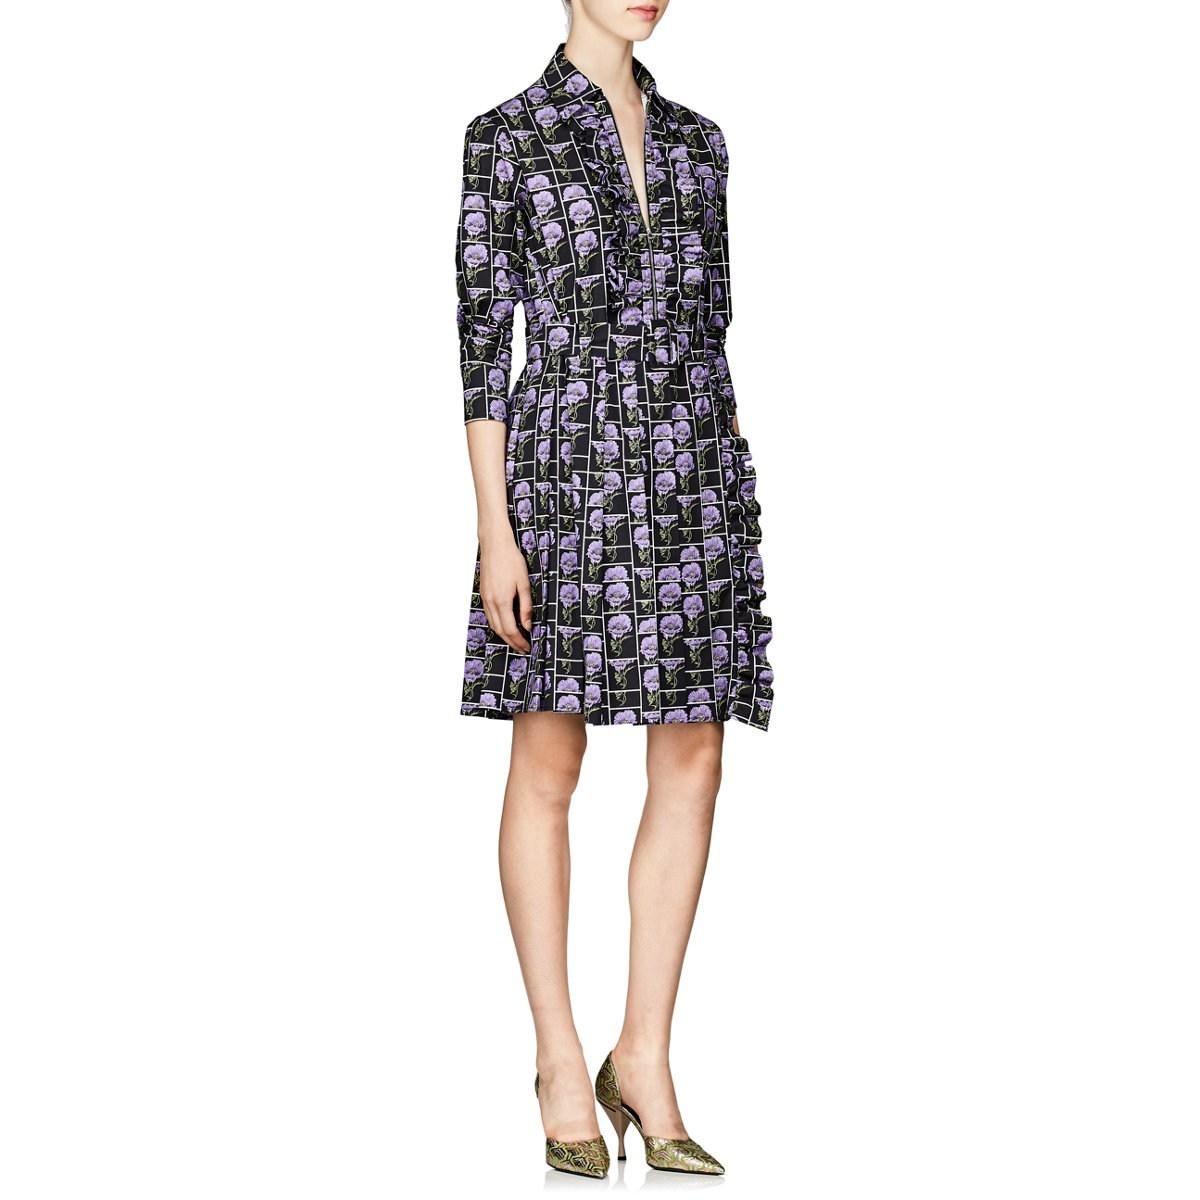 998054d9ccf Lyst - Prada Poppy-print Stretch-cotton Poplin Shirtdress in Purple